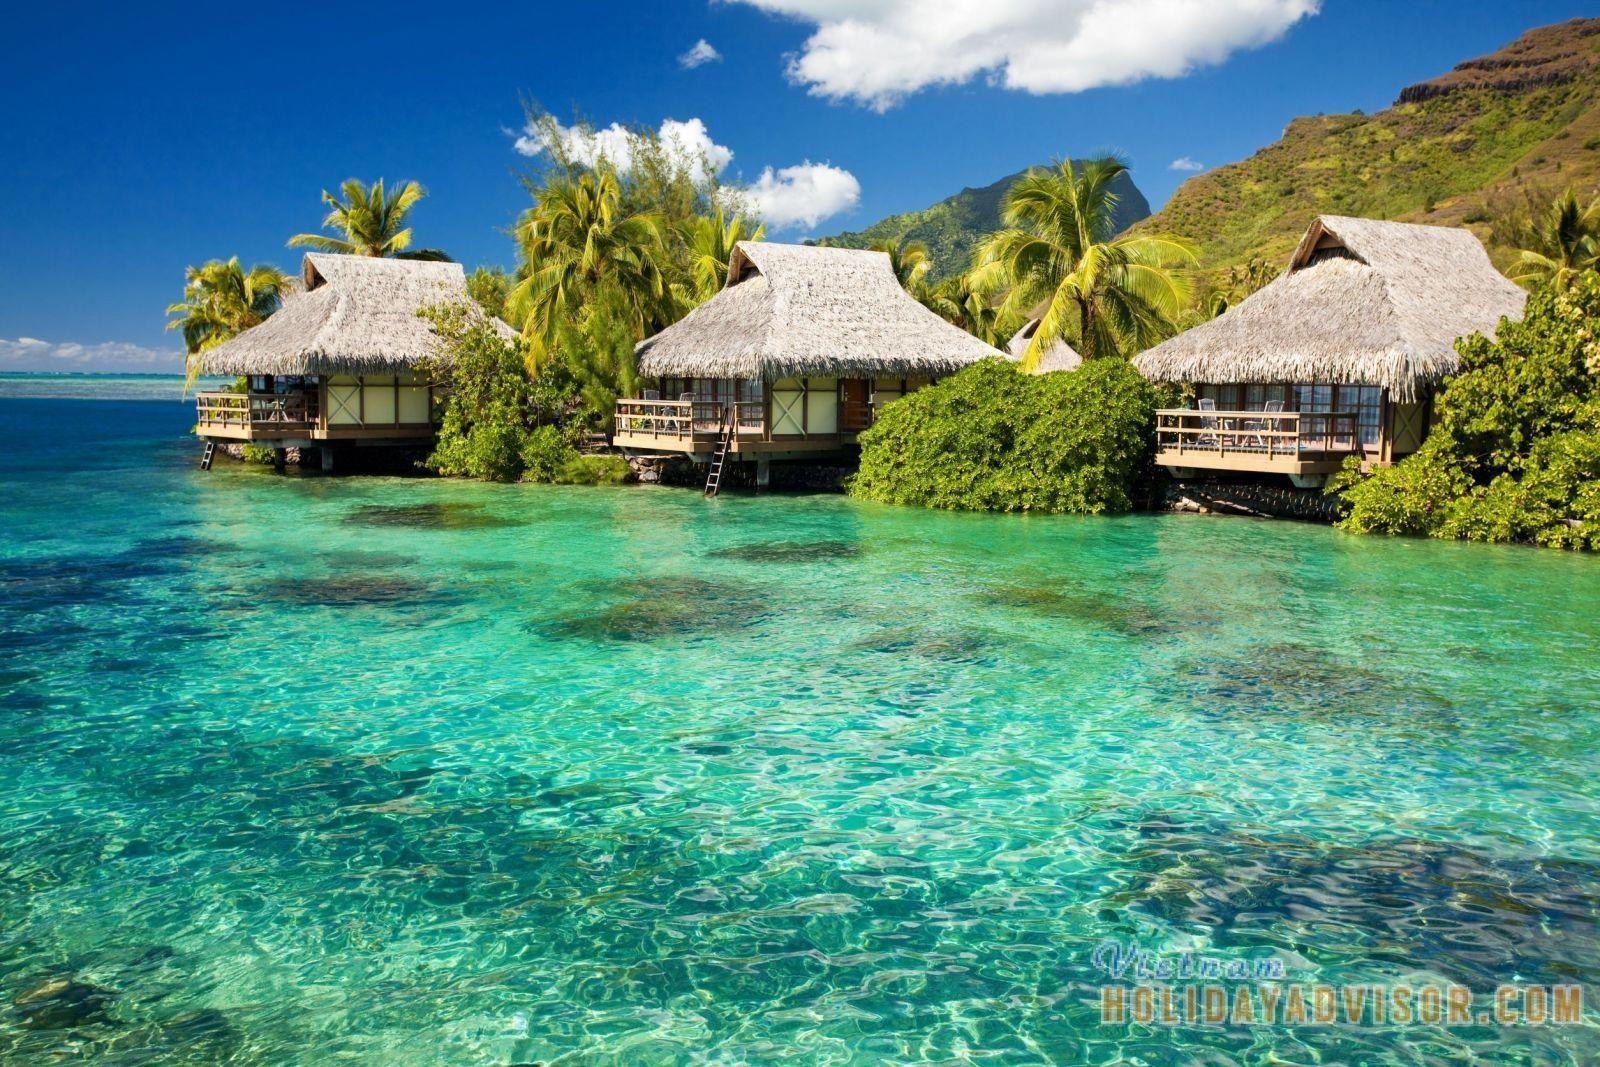 Cats Craigslist Ncats Code 6825591570 Florida Keys Resorts Key Largo Vacation Places To Go